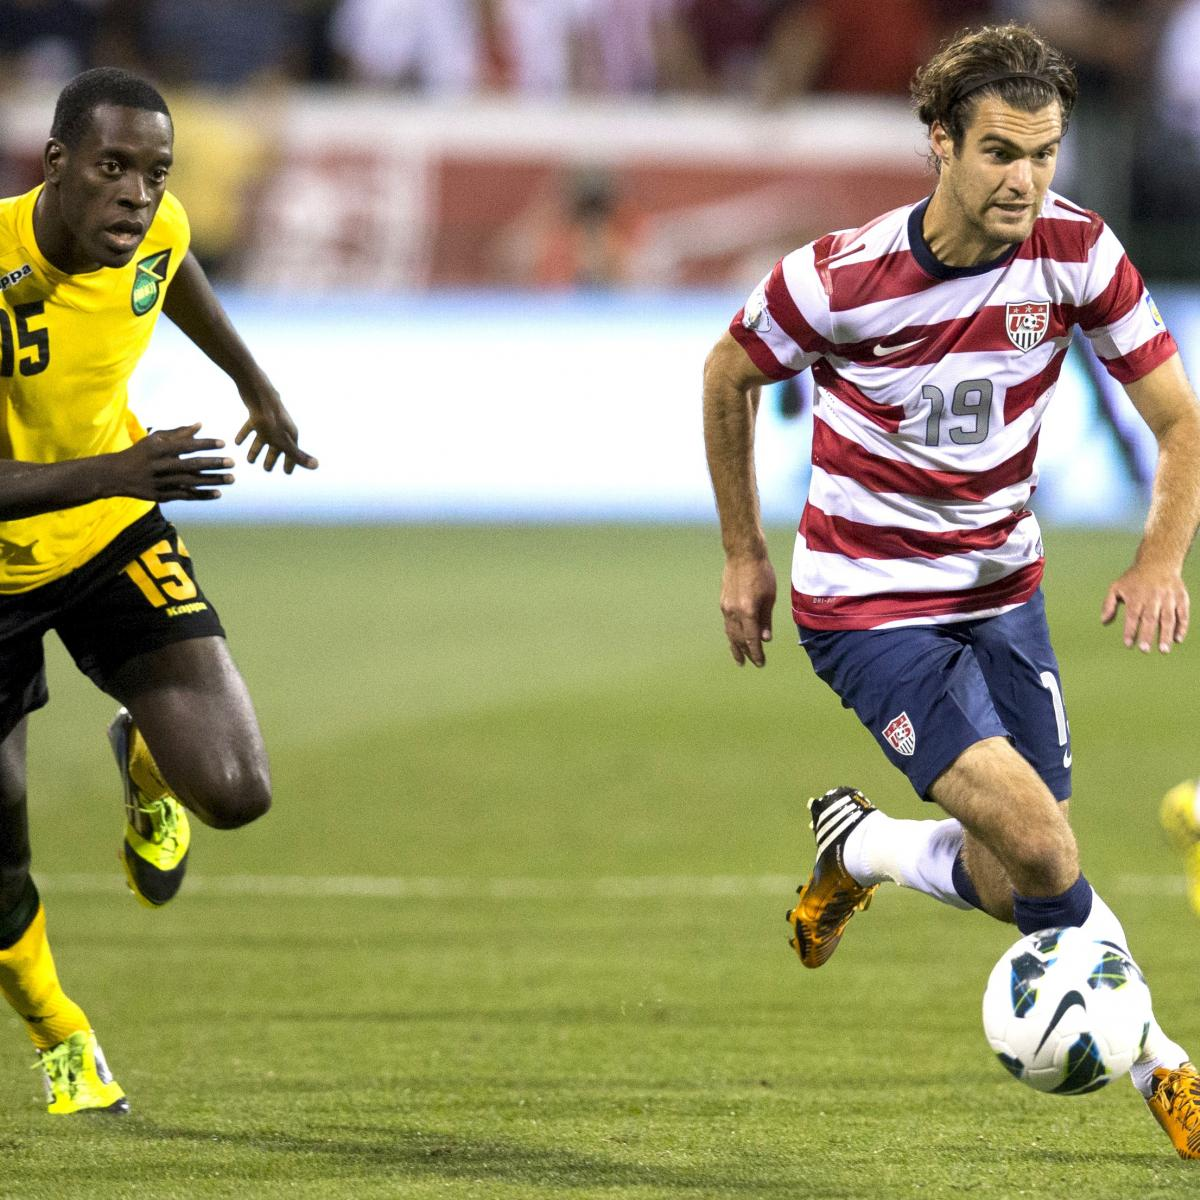 Tottenham Vs Ajax Highlights Football: United States Vs. Jamaica: World Cup Qualifying Live Score